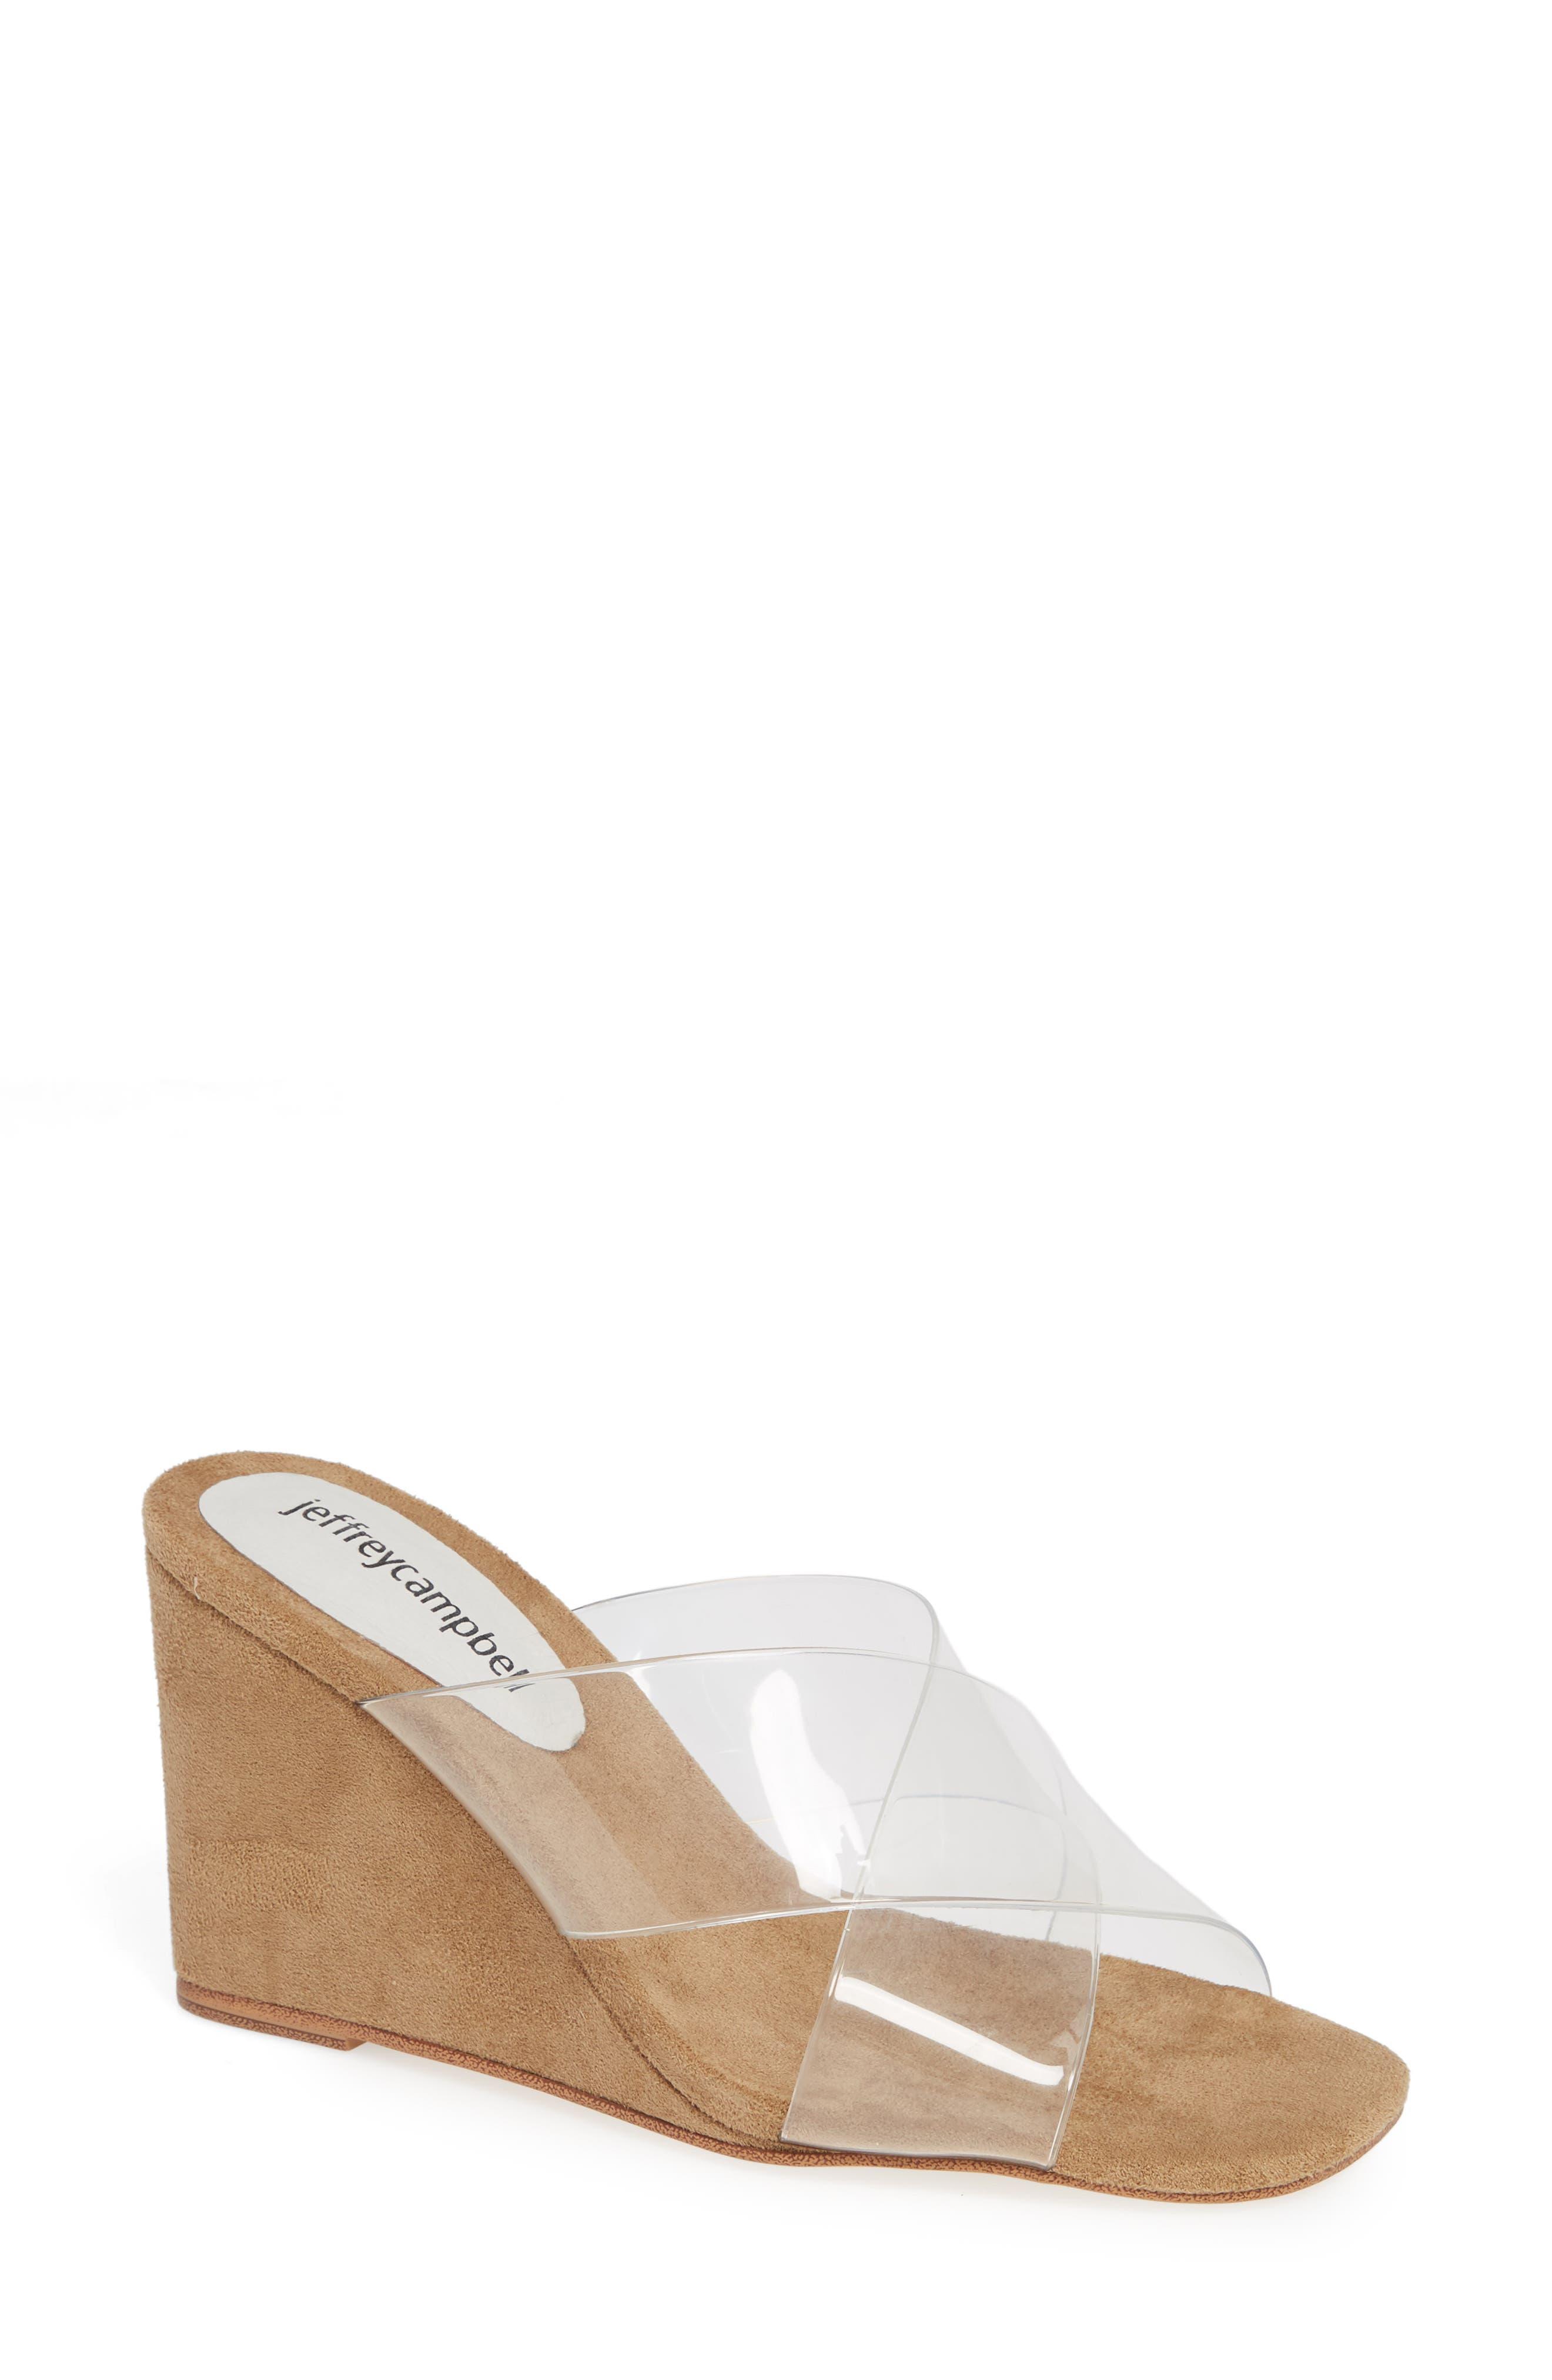 Mystical Wedge Sandal,                         Main,                         color, IRIDESCENT